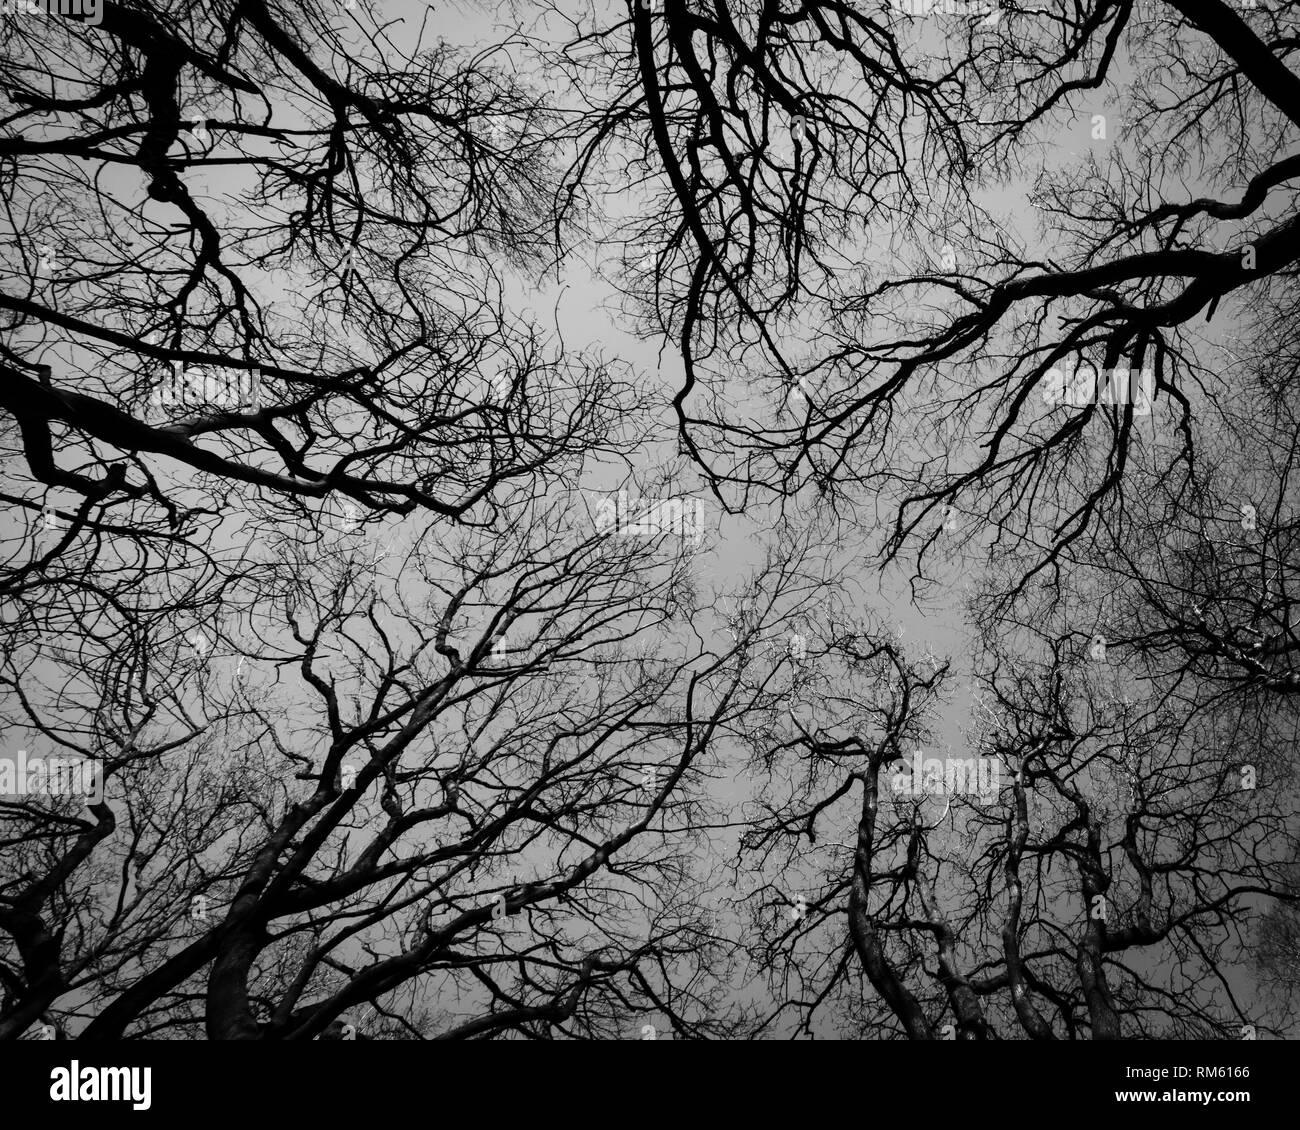 Nerve Fibres Black And White Stock Photos  U0026 Images